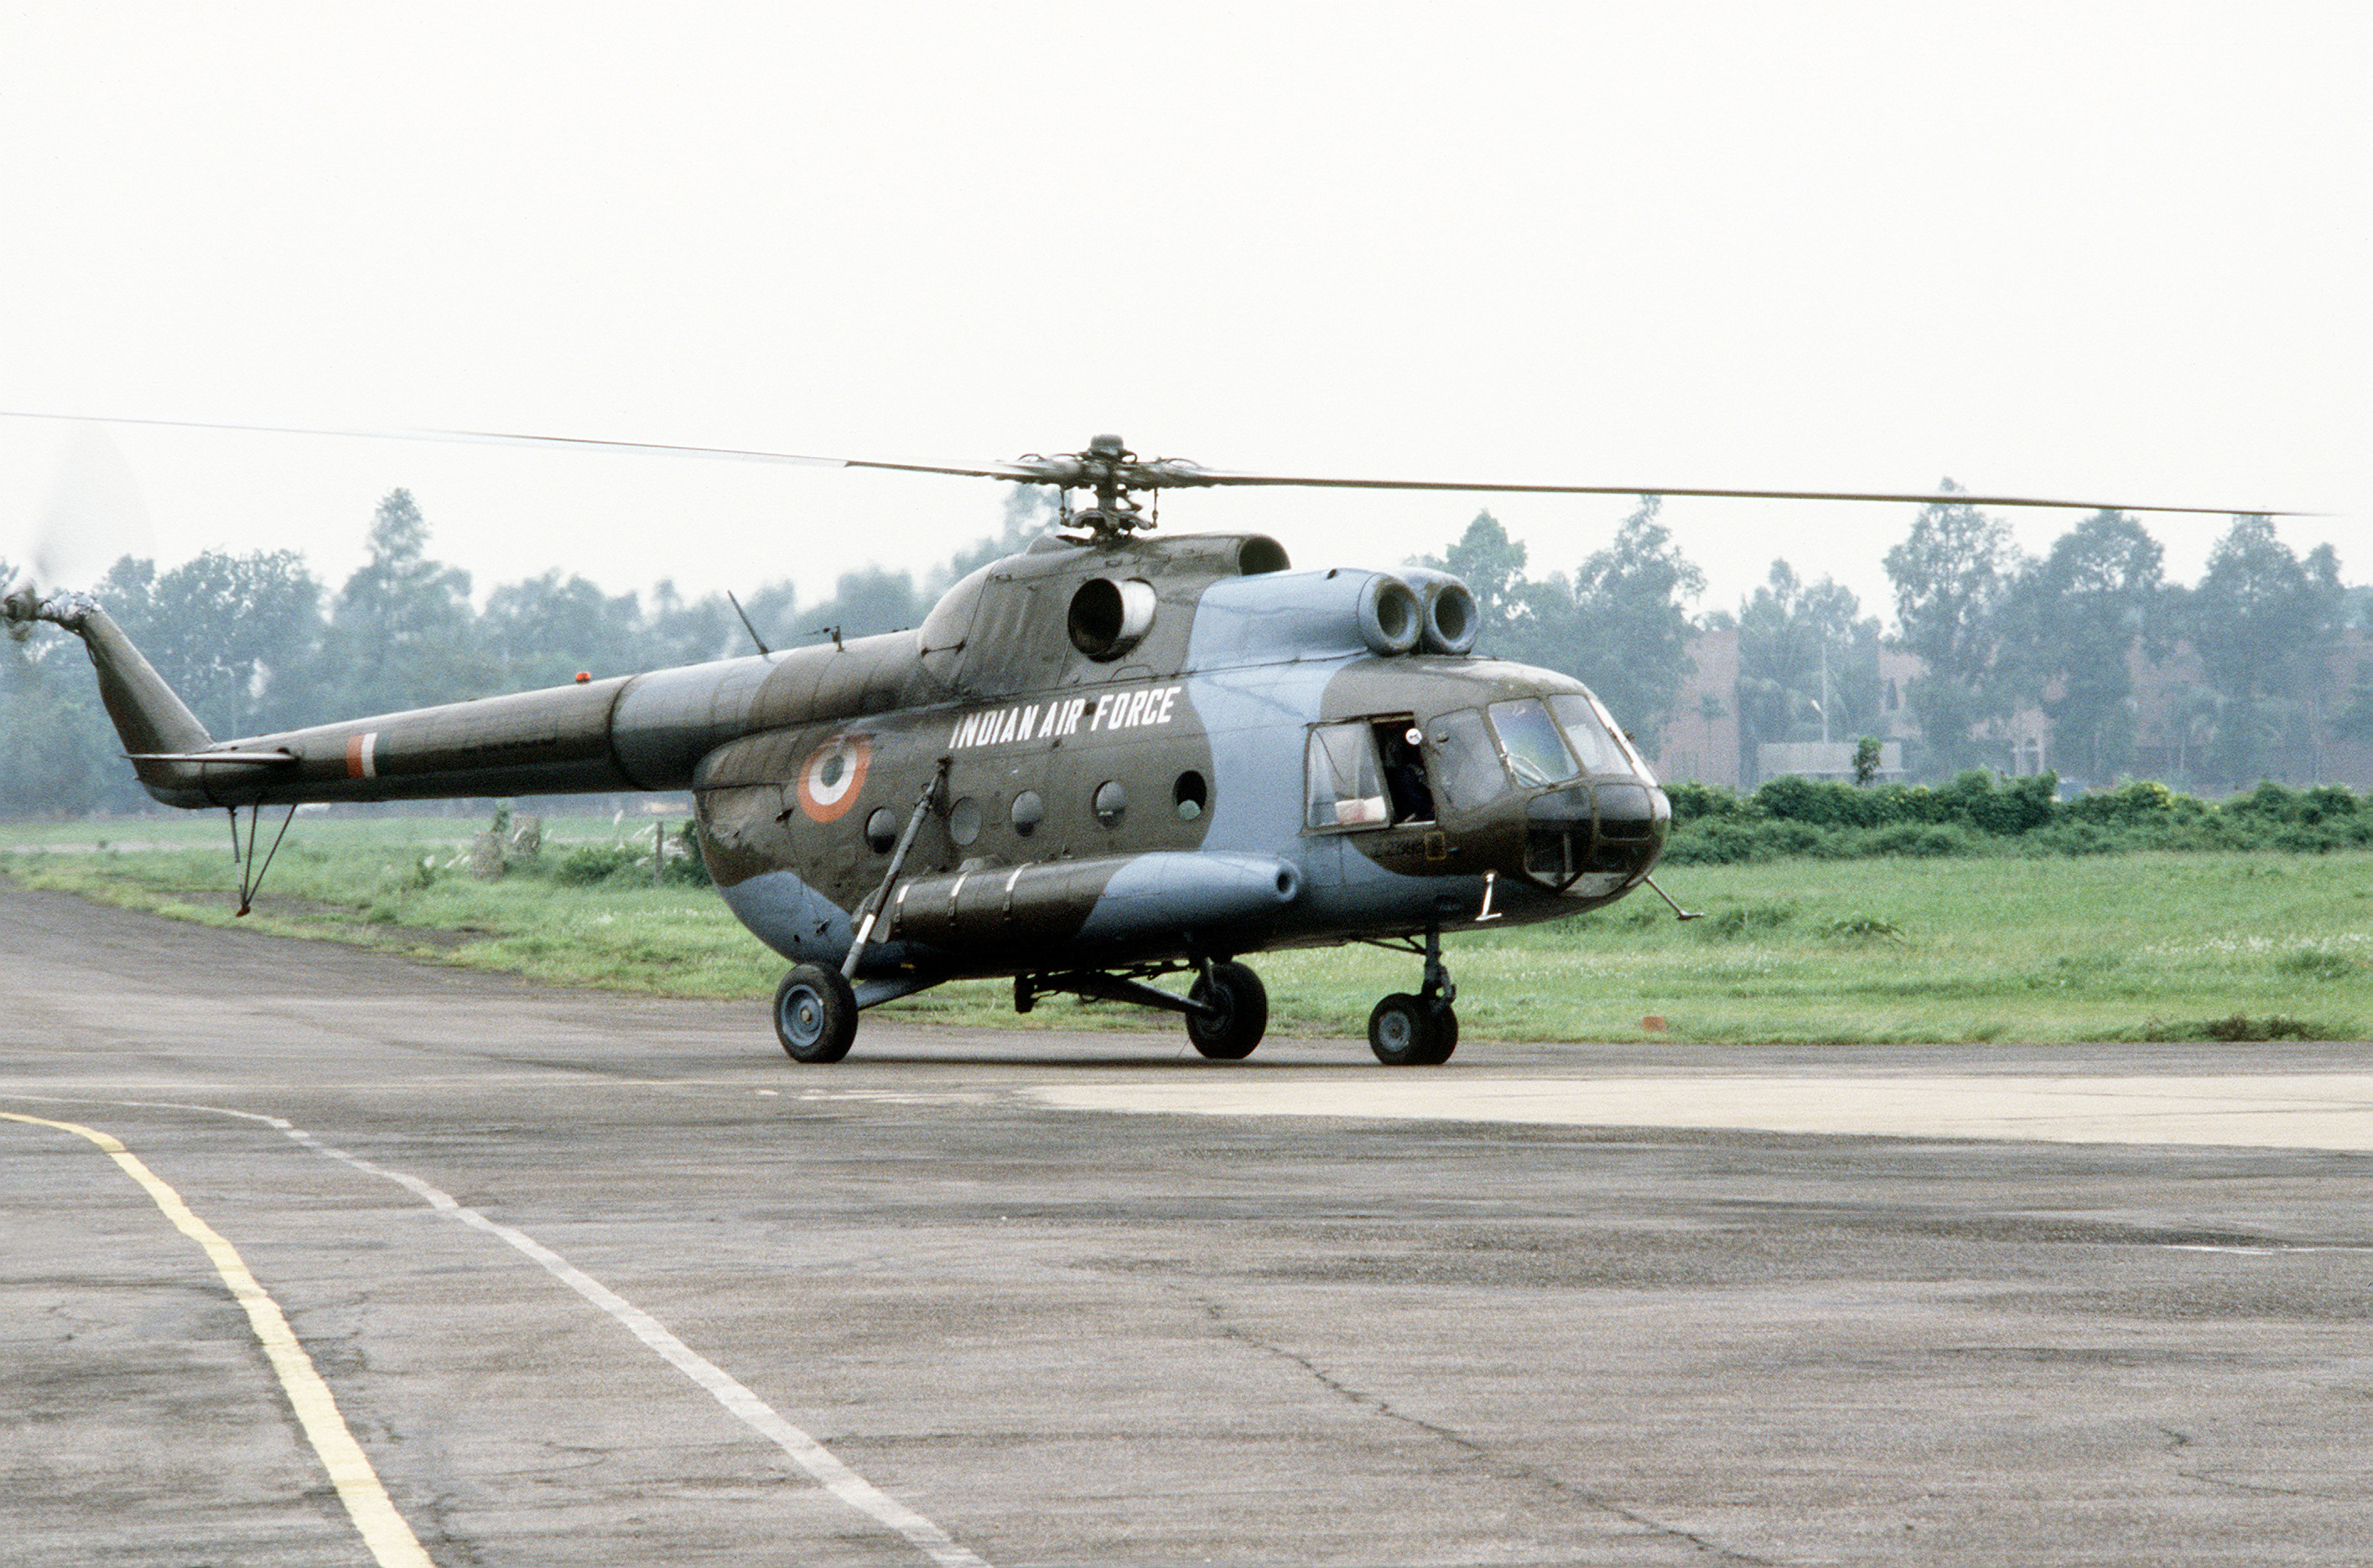 Elicottero Mi 8 : File iaf mi eg wikimedia commons